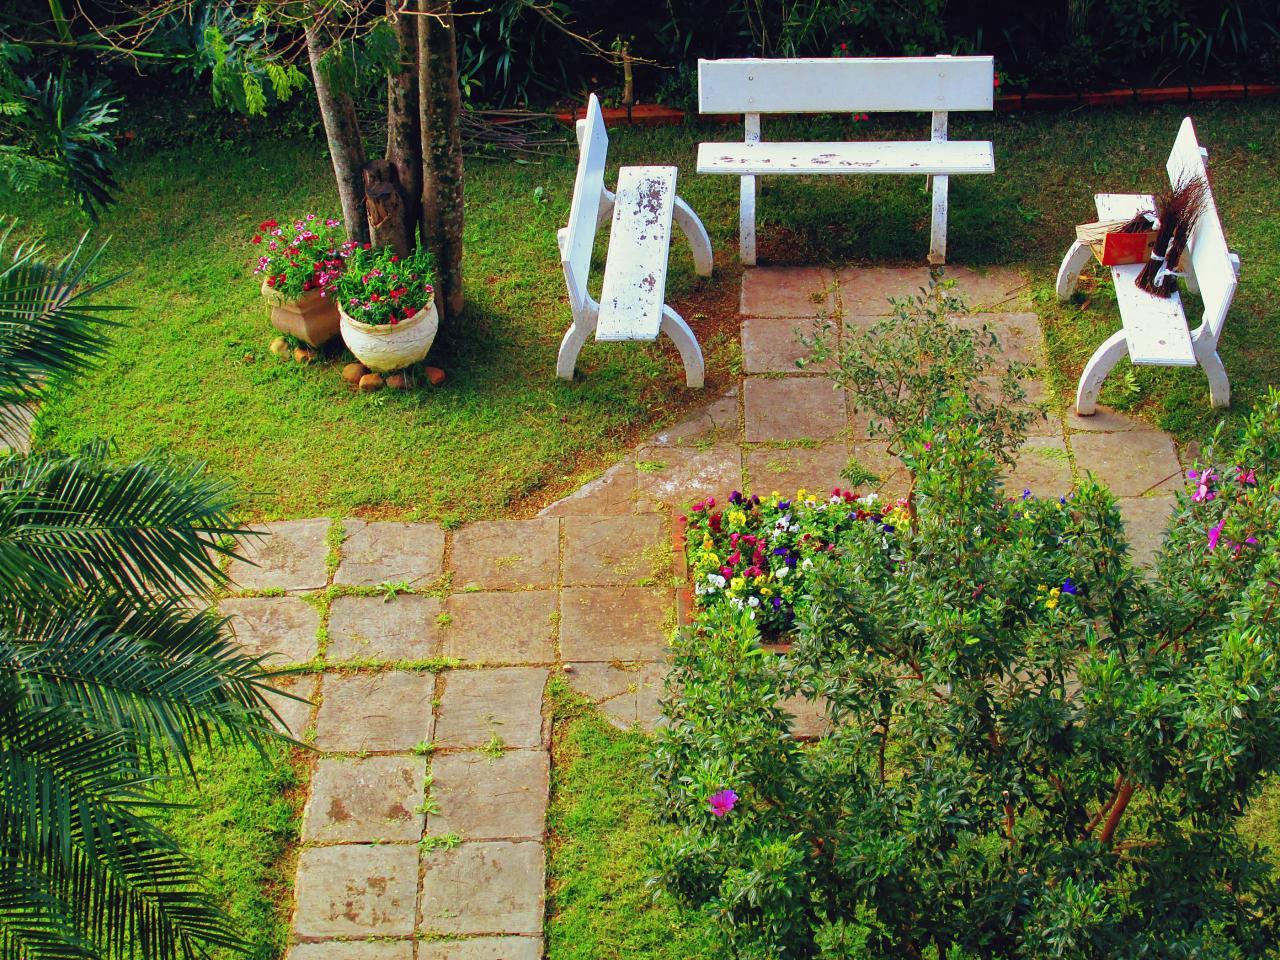 Dise os atractivos para jardines peque os lifestyle de - Arboles pequenos para jardin ...